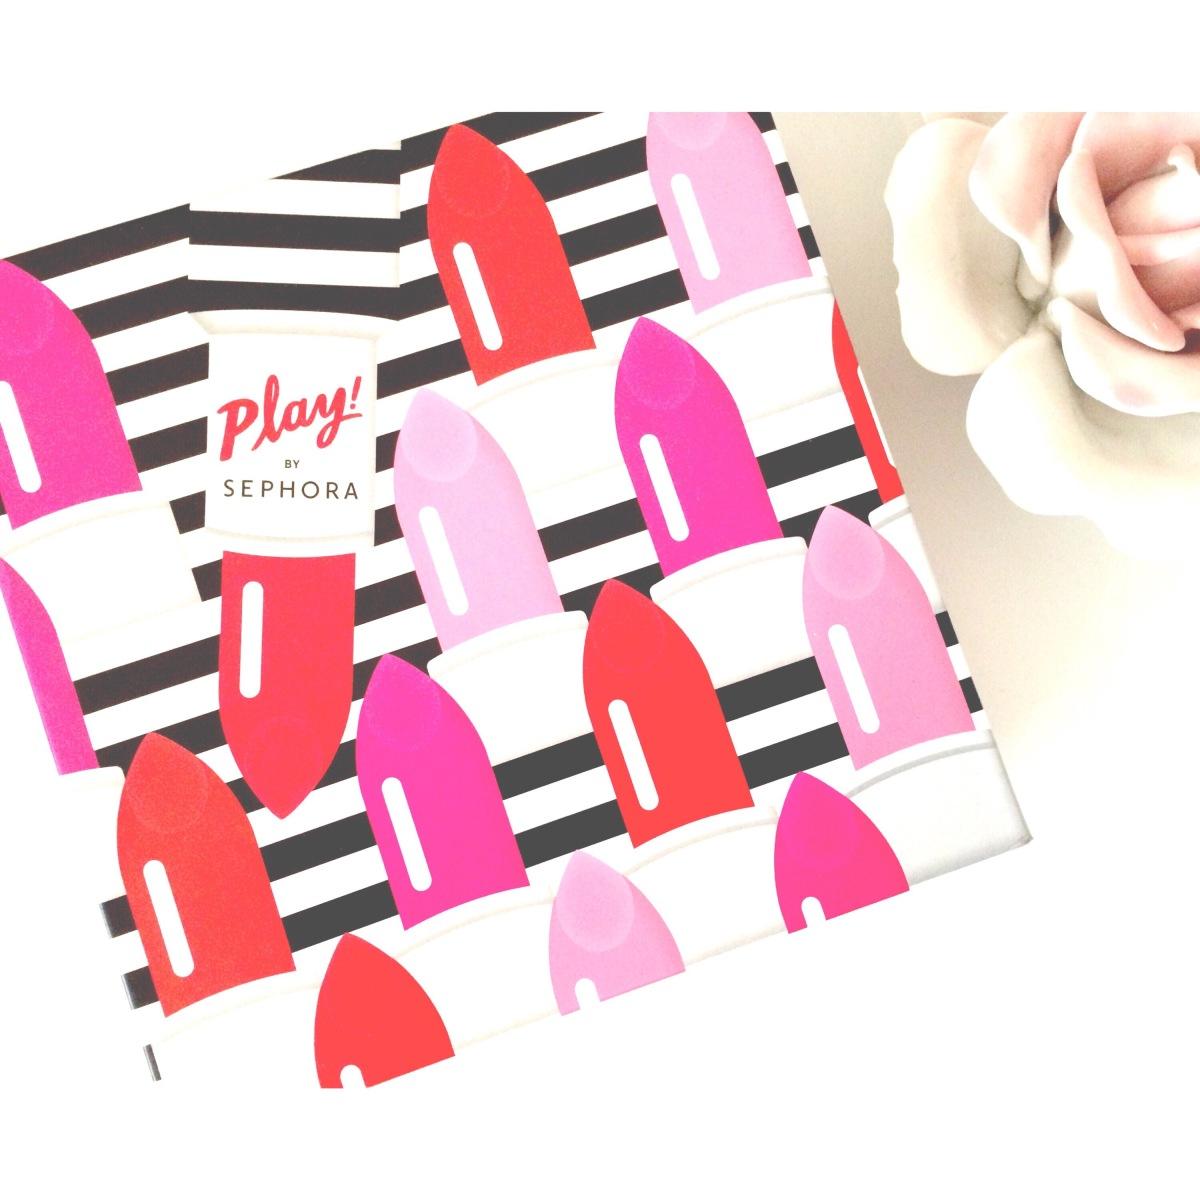 Play! By Sephora | December2015